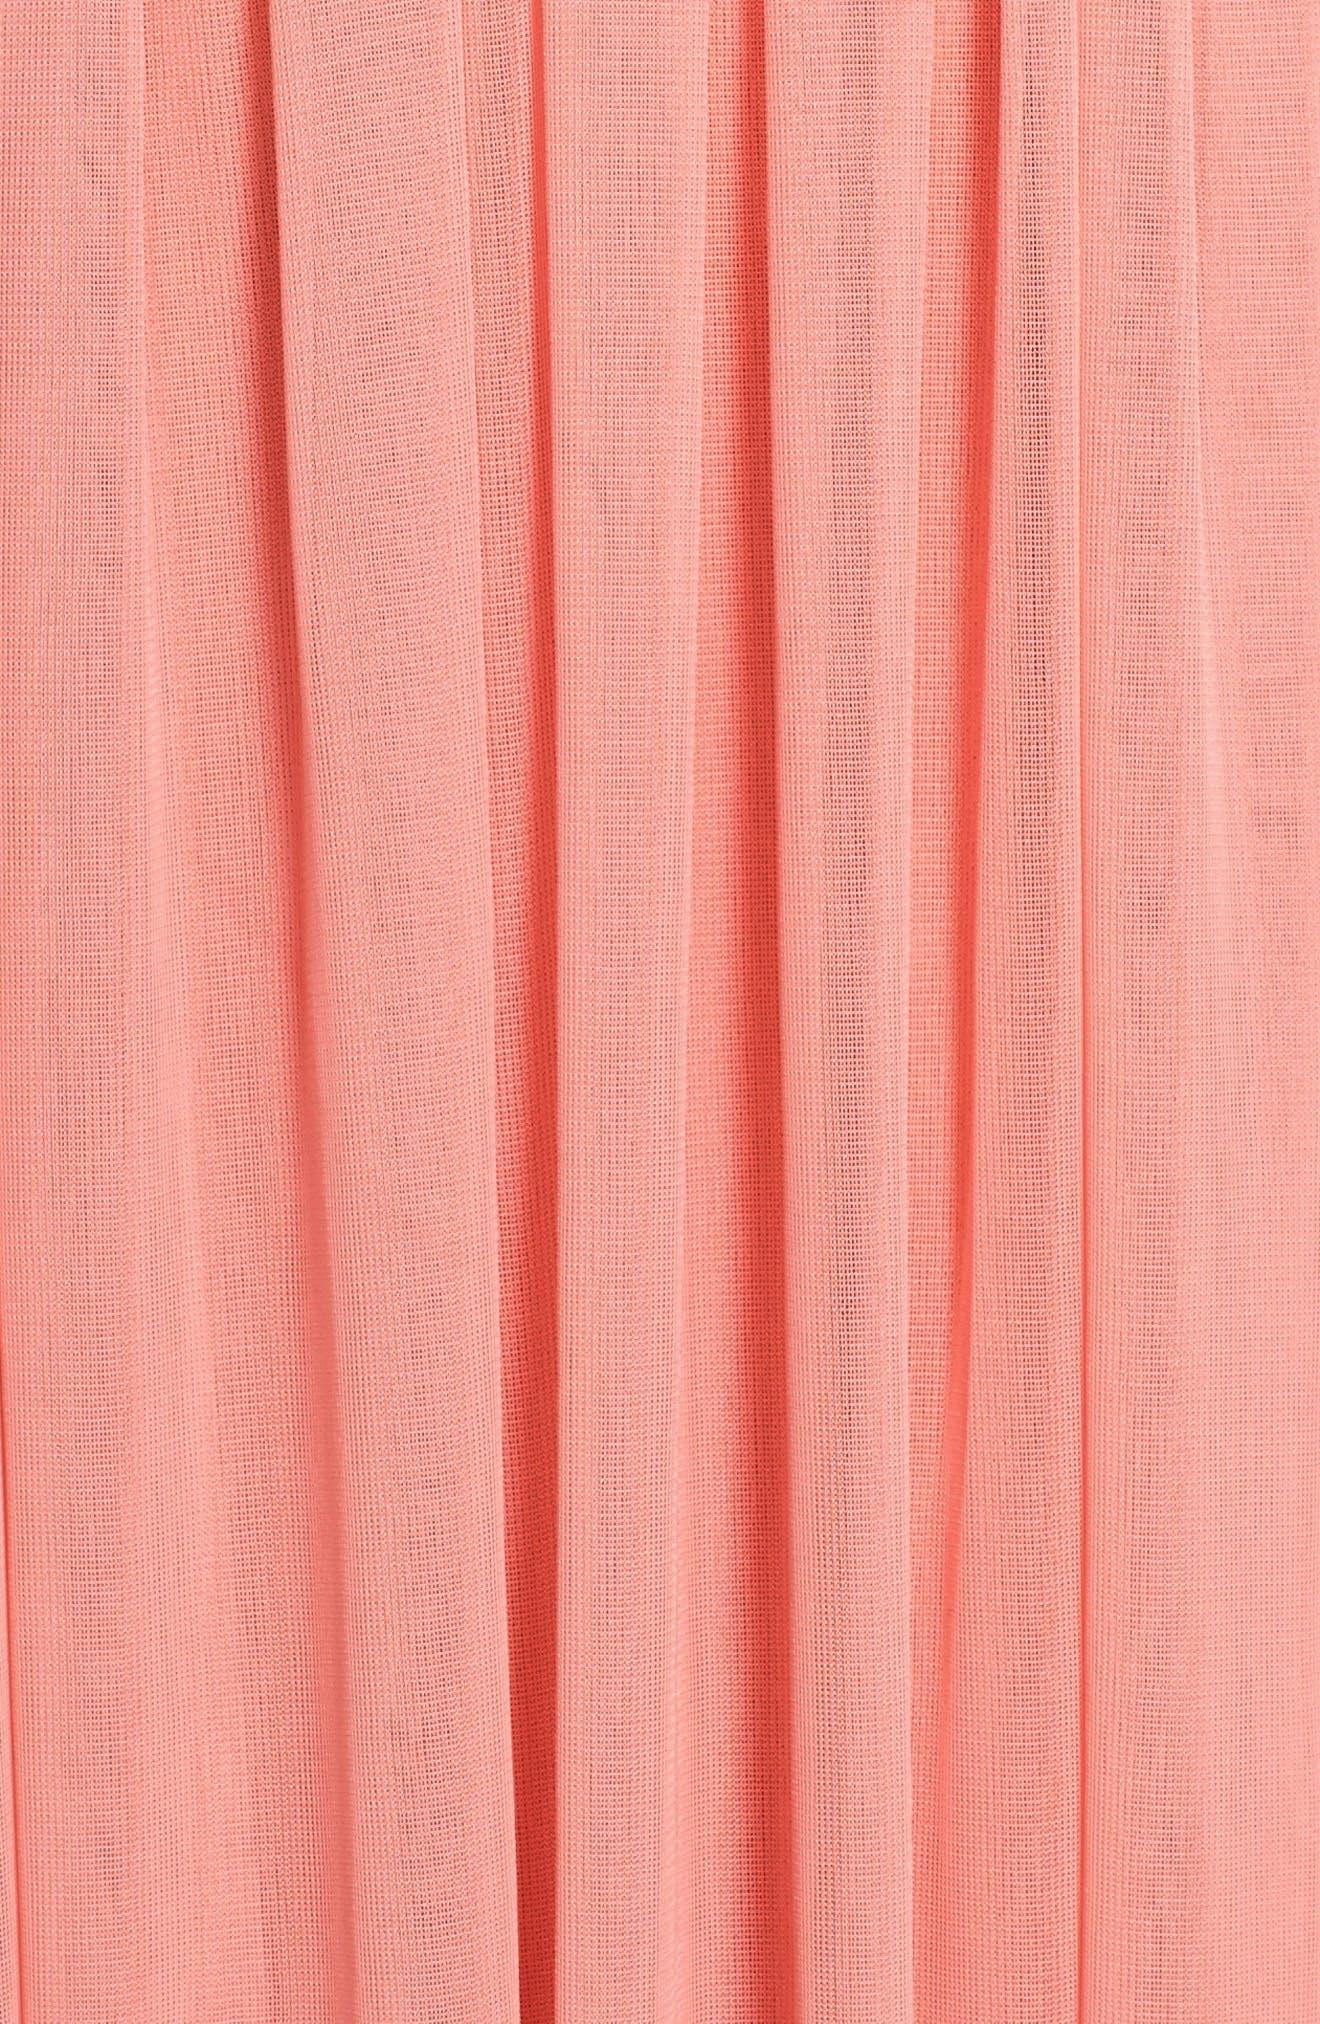 Shirred Chiffon V-Neck Gown,                             Alternate thumbnail 5, color,                             633